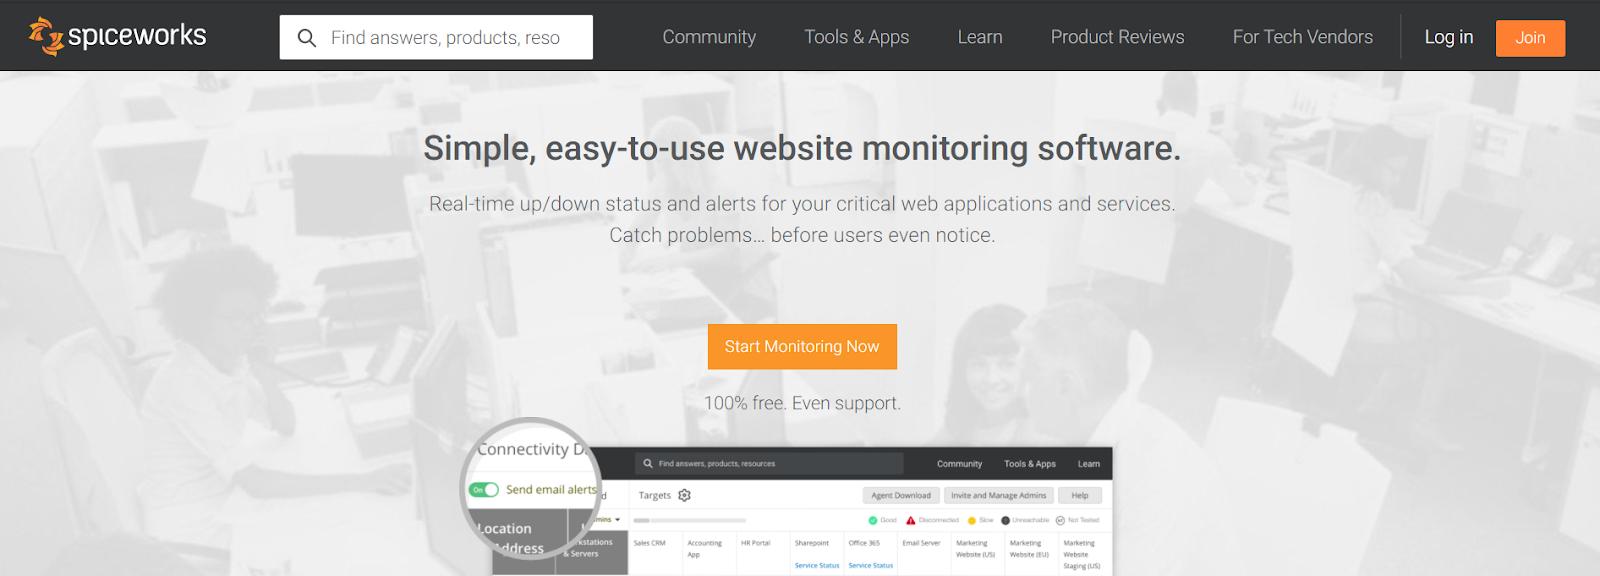 Spiceworks Server monitoring software